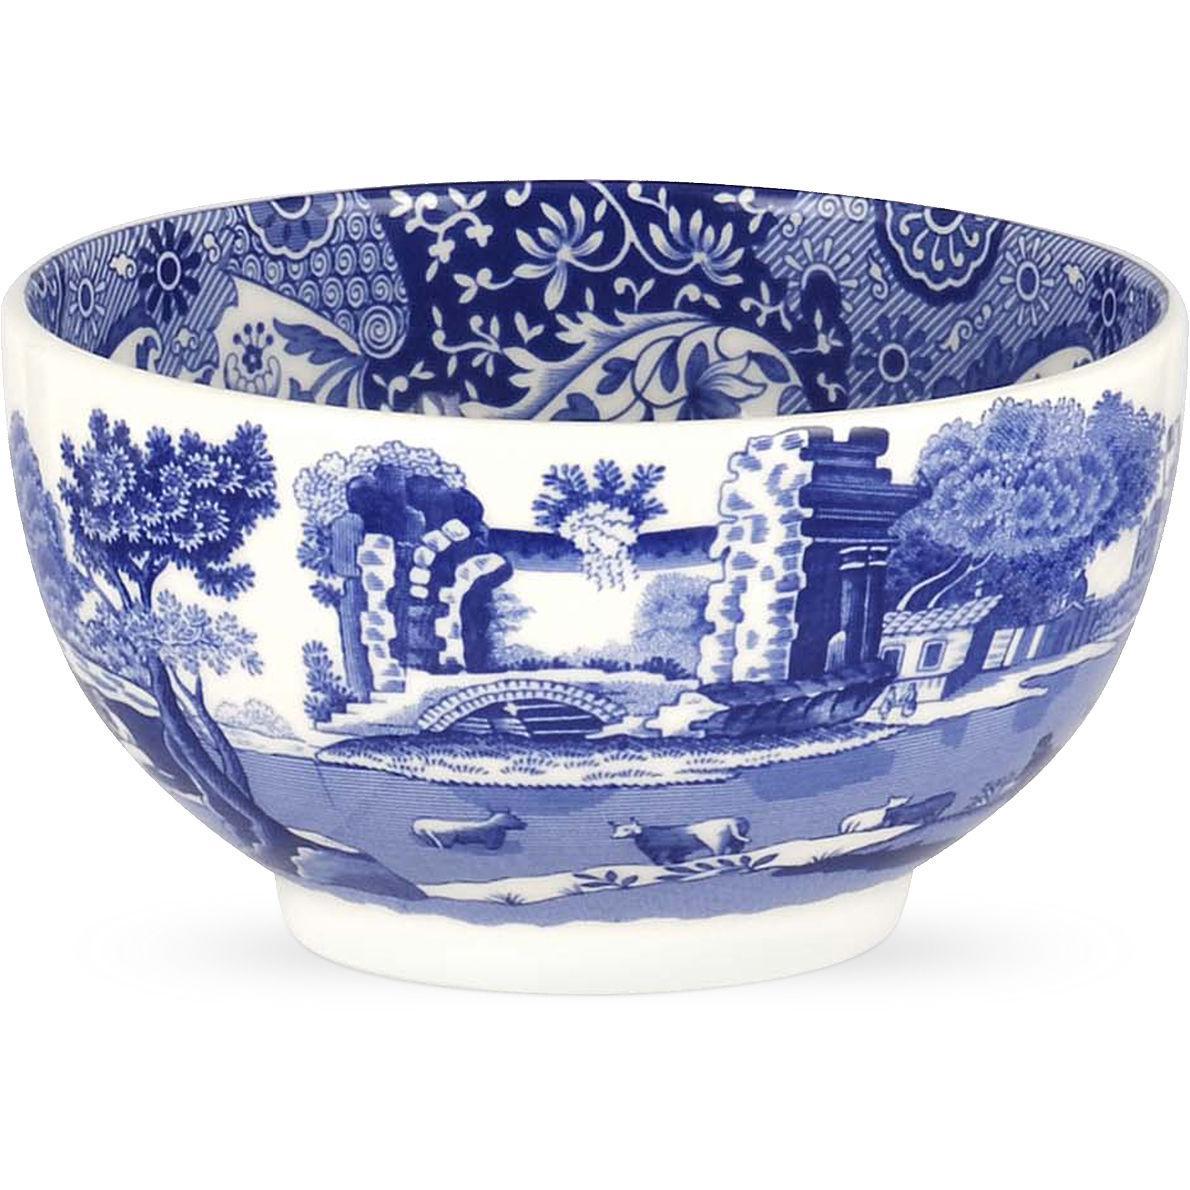 Spode Blue Italian Dip Bowl 11cm Louis Potts